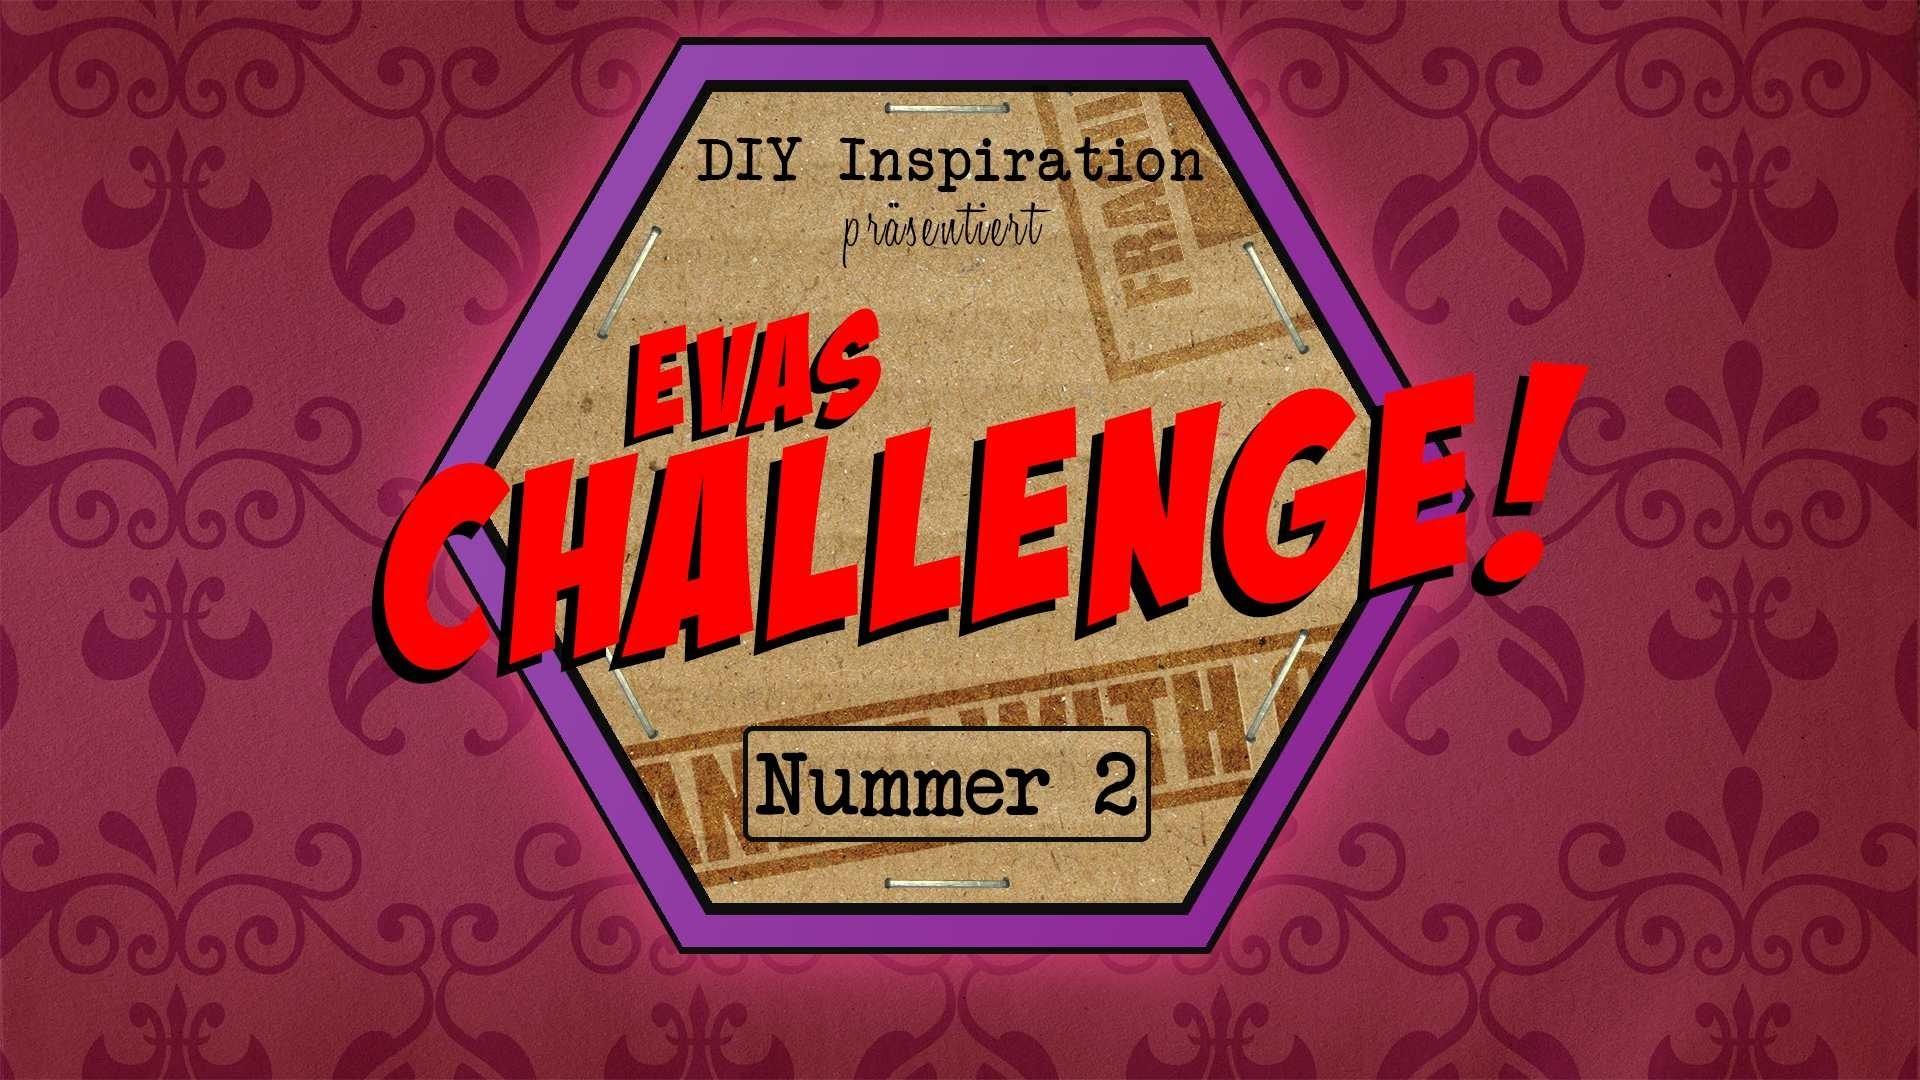 DIY Inspiration Challenge #2 Jutebeutel | Eva und Kathi's Challenge | Do It Yourself Tutorial